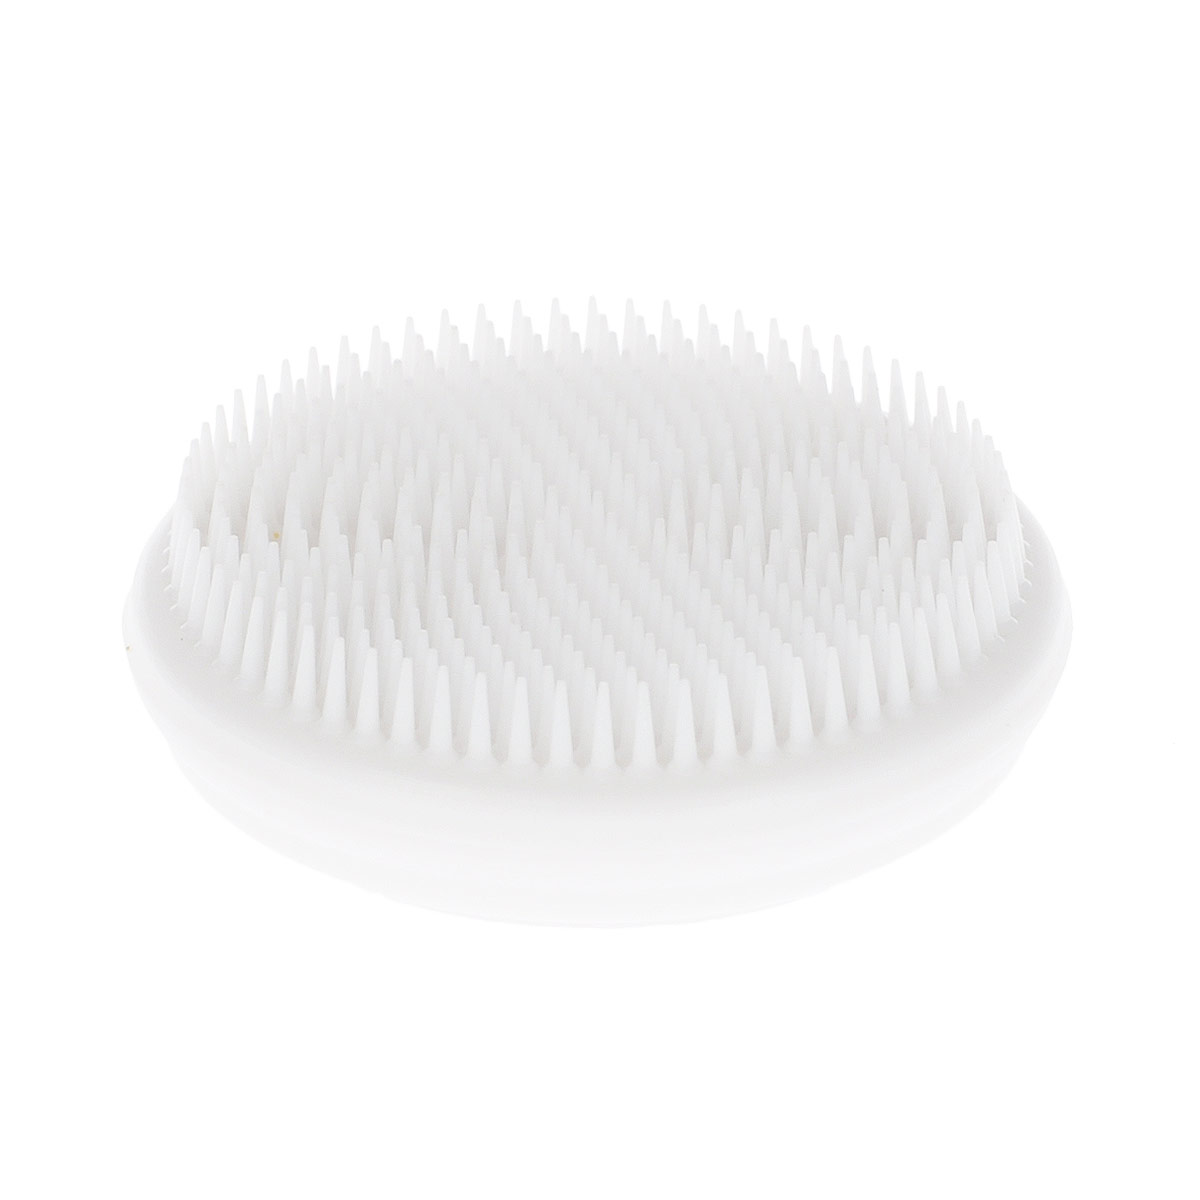 TouchbeautyЗапасная щетка к приборам для очищения кожи при умывании AC-07593 Touchbeauty